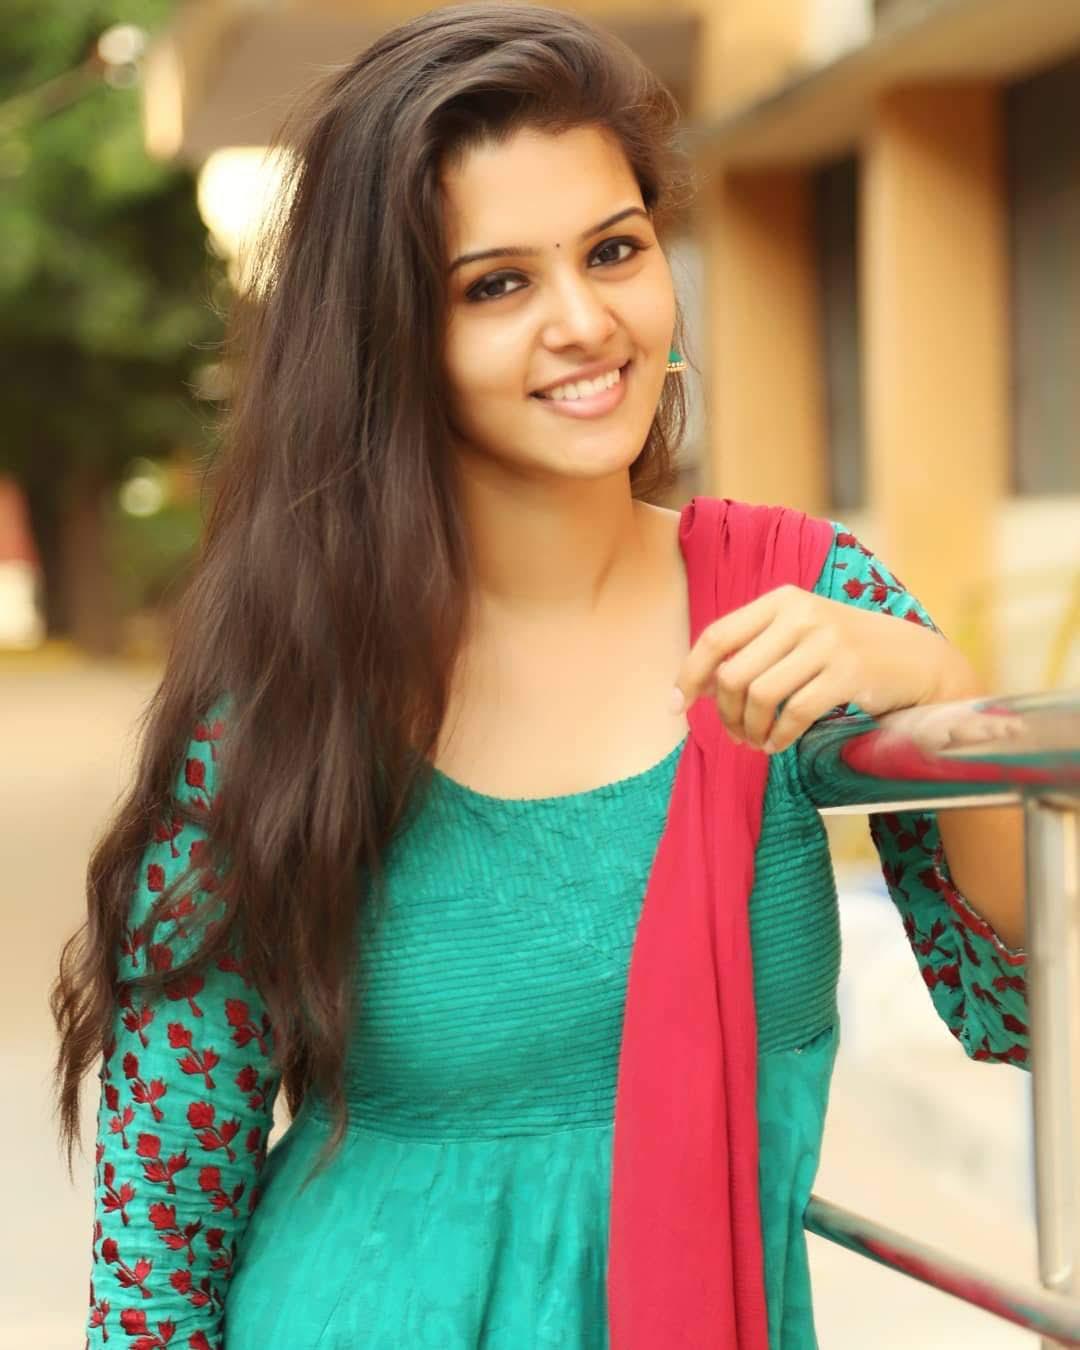 Roshni-Prakash-images-956574